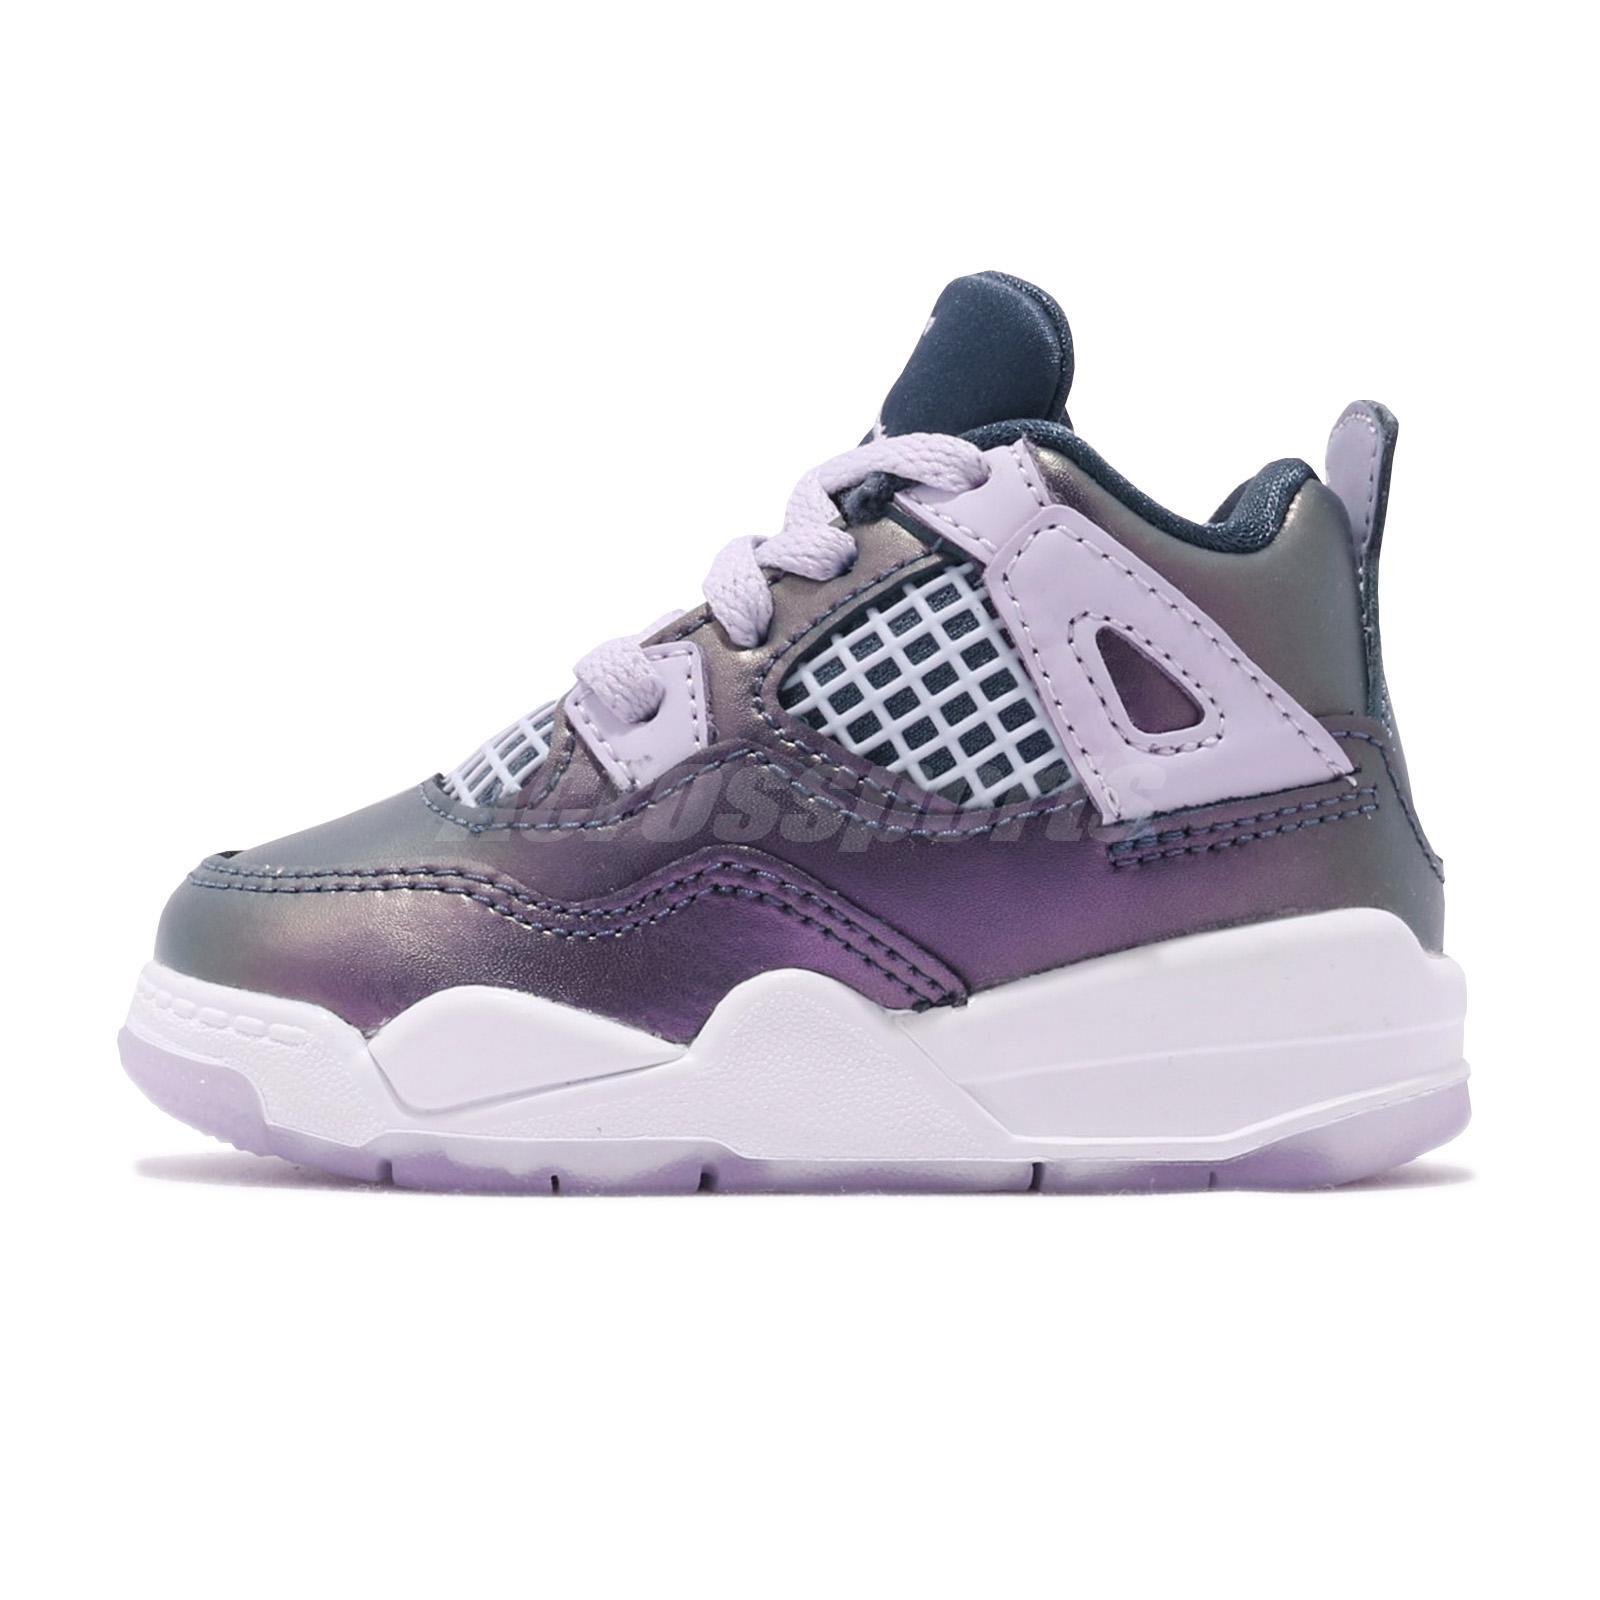 uk availability 6c6ad 0ff68 Nike Jordan 4 Retro TD IV AJ4 Monsoon Blue White Toddler Infant Shoes  BQ9041-400